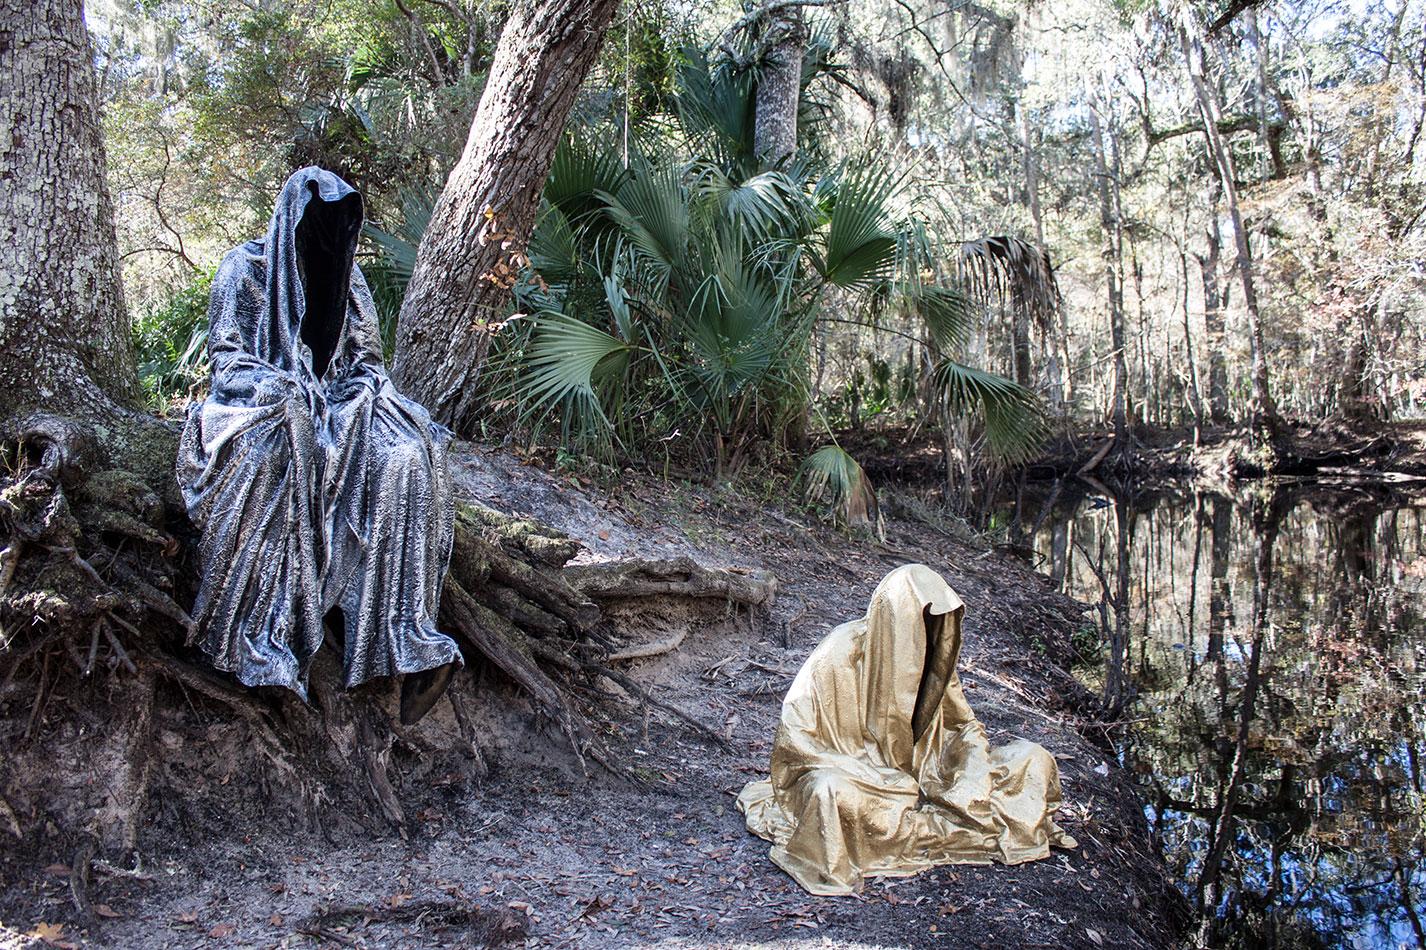 art-basel-miami-beach-fair-usa-florida-guardians-of-time-manfred-kili-kielnhofer-contemporary-fine-art-modern-arts-design-antiques-sculpture-5673